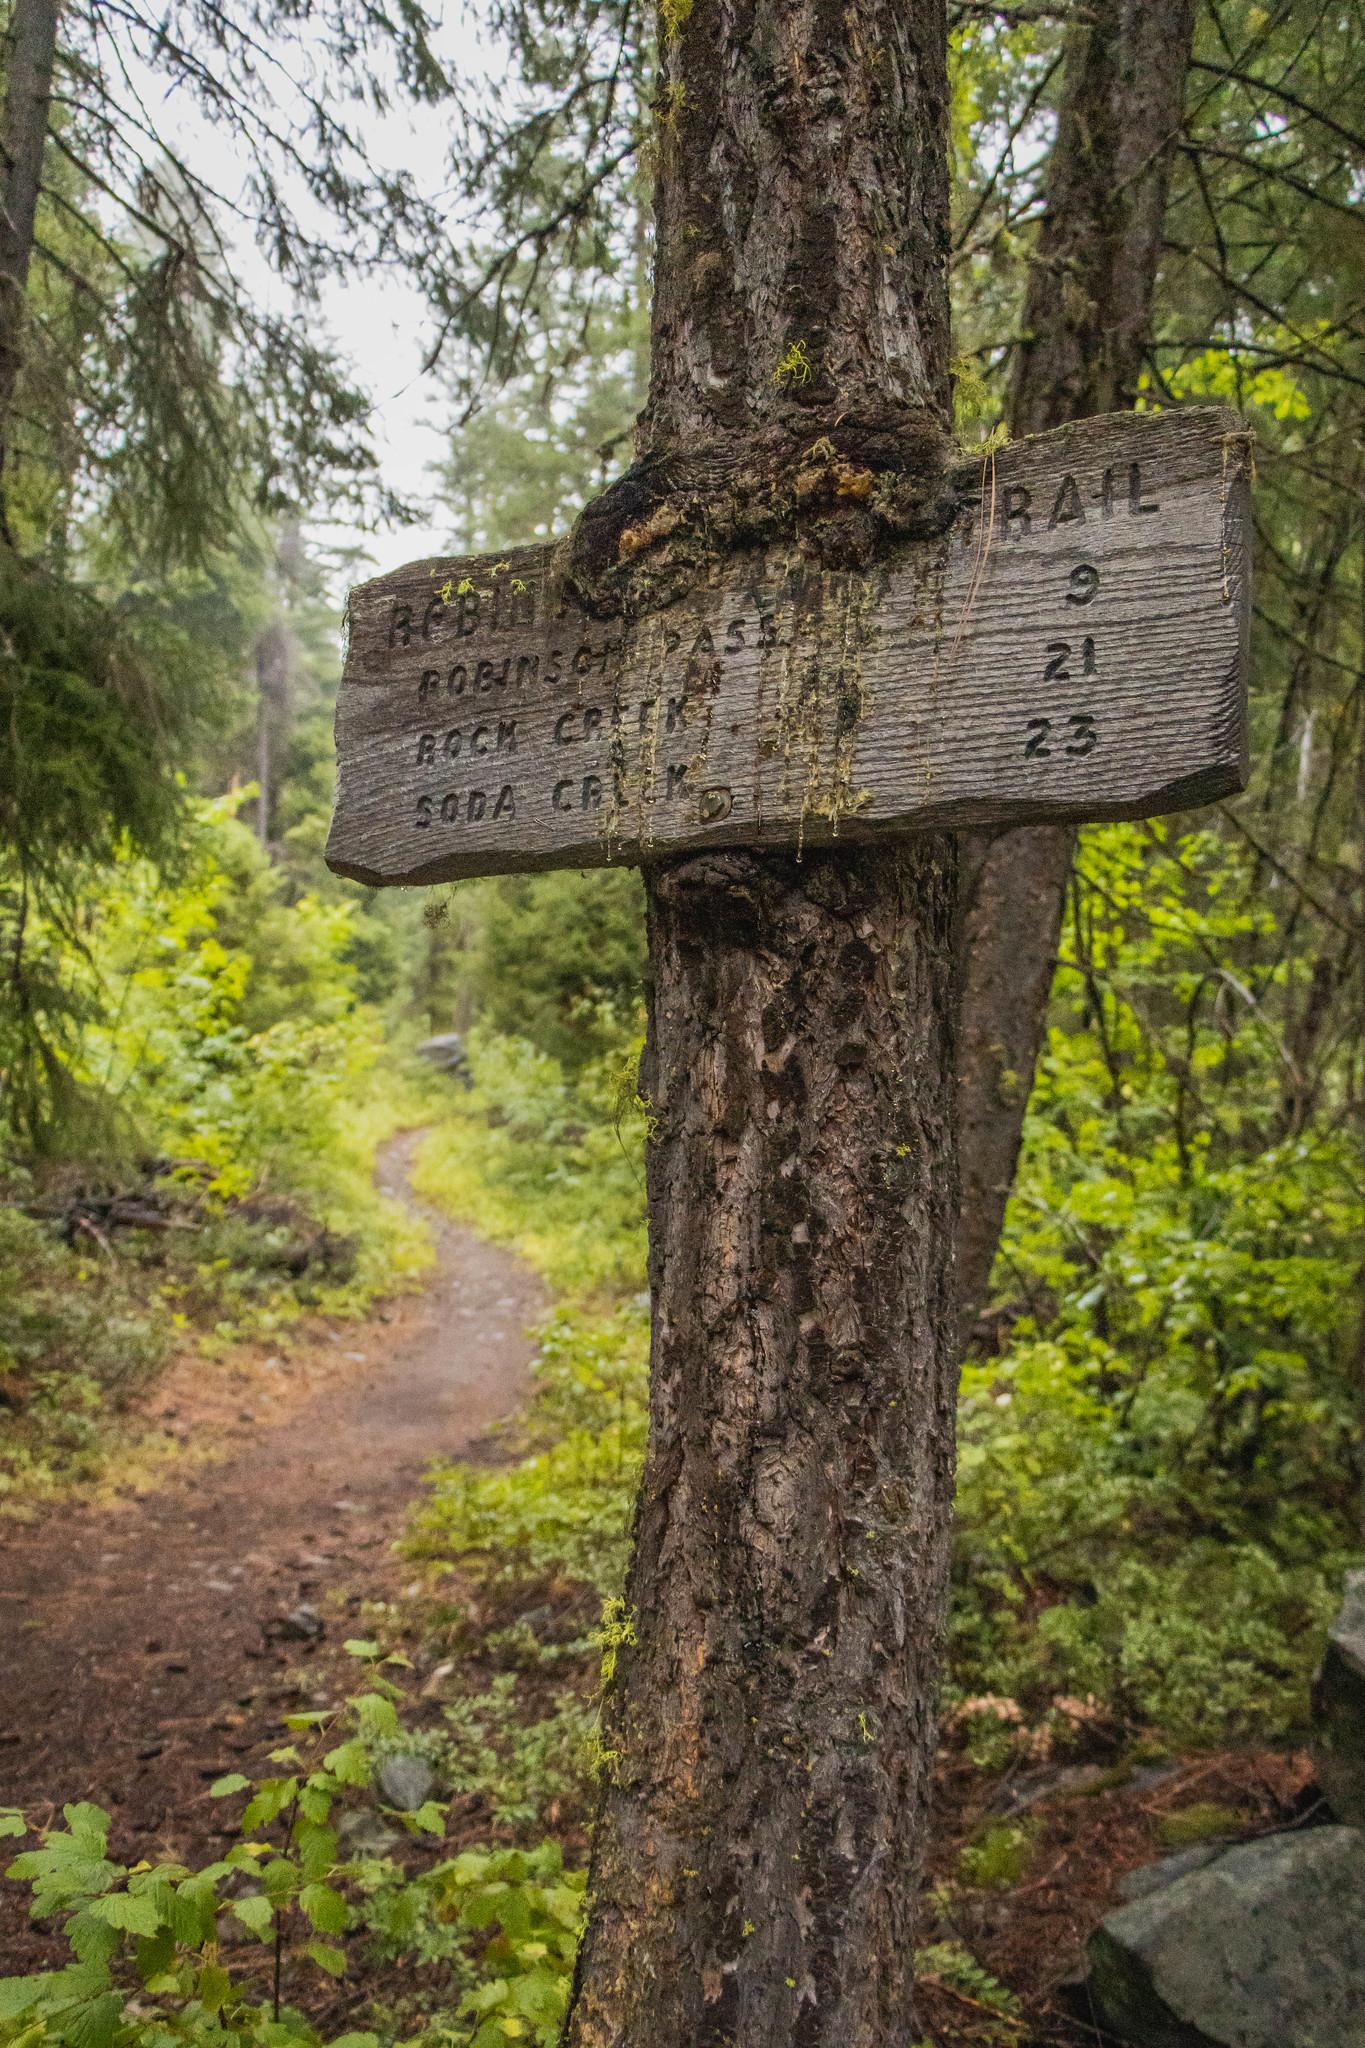 Robinson Creek Trail sign